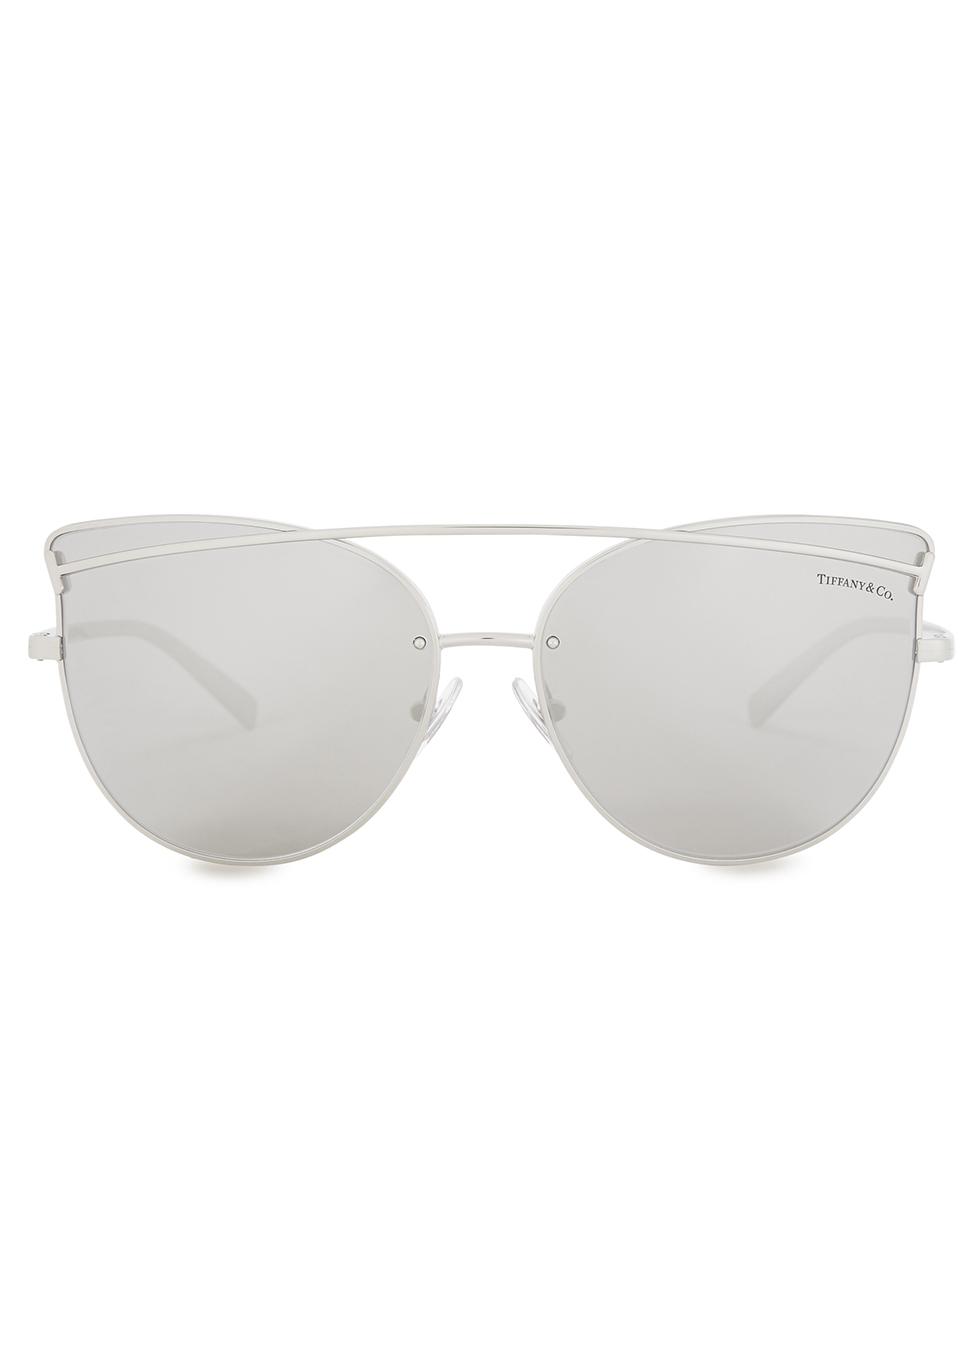 Silver-tone cat-eye sunglasses - TIFFANY